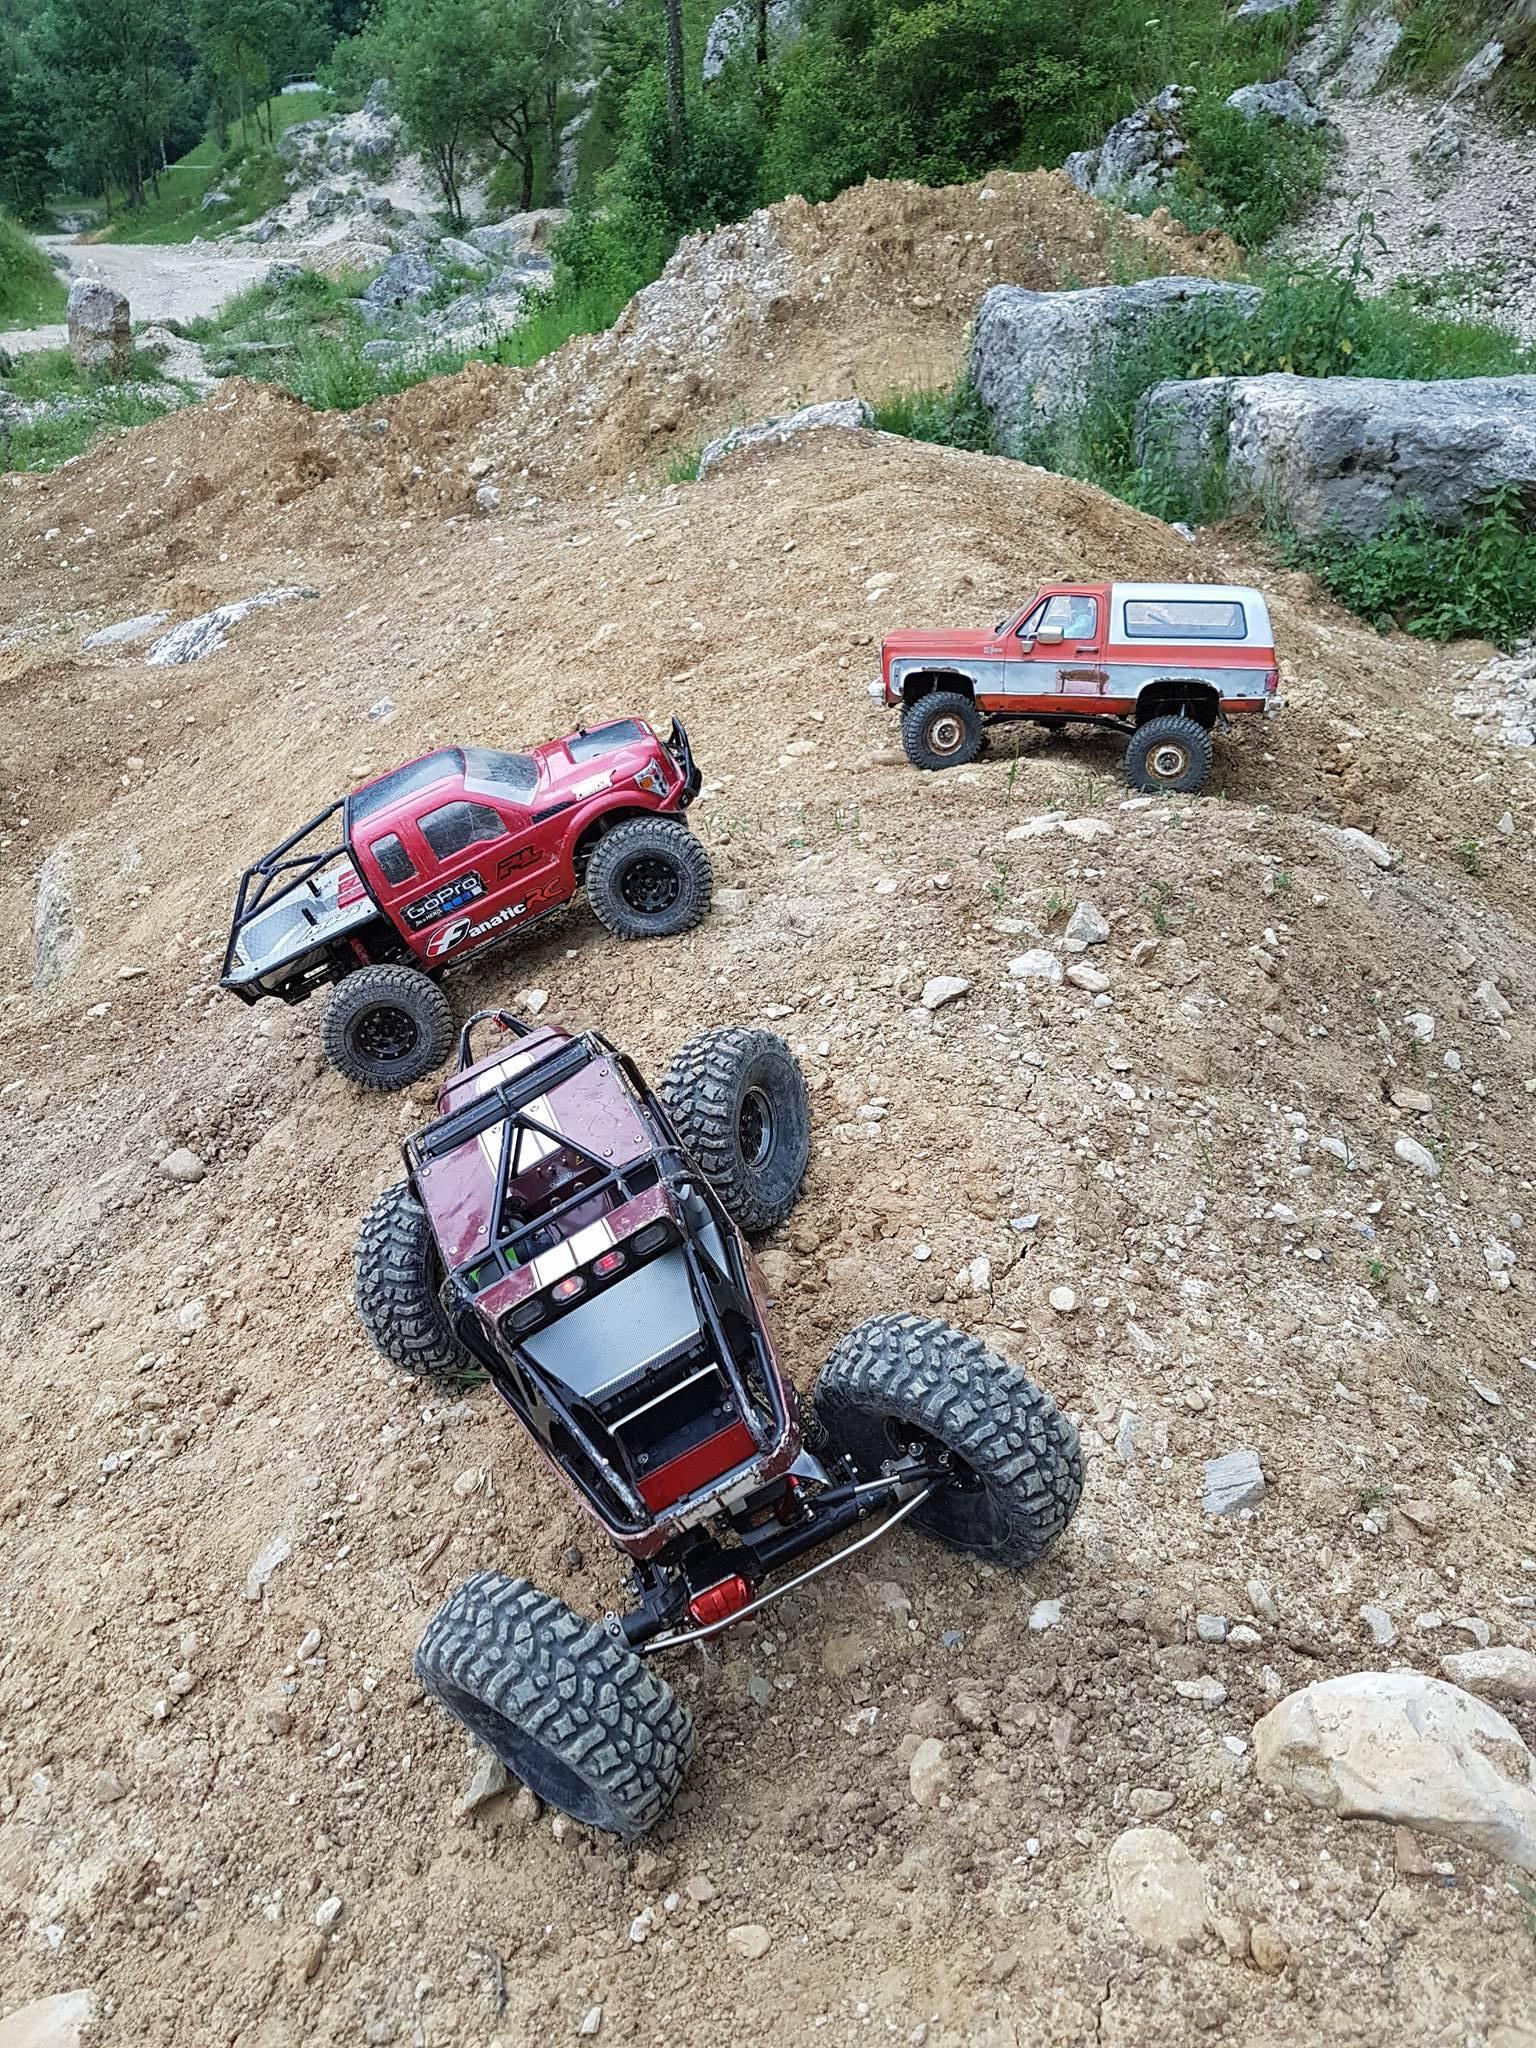 Farm Truck Chevrolet Blazer K5 sur TF2, Road Trip ! - Page 3 4717191940084213034321897753211462524367o